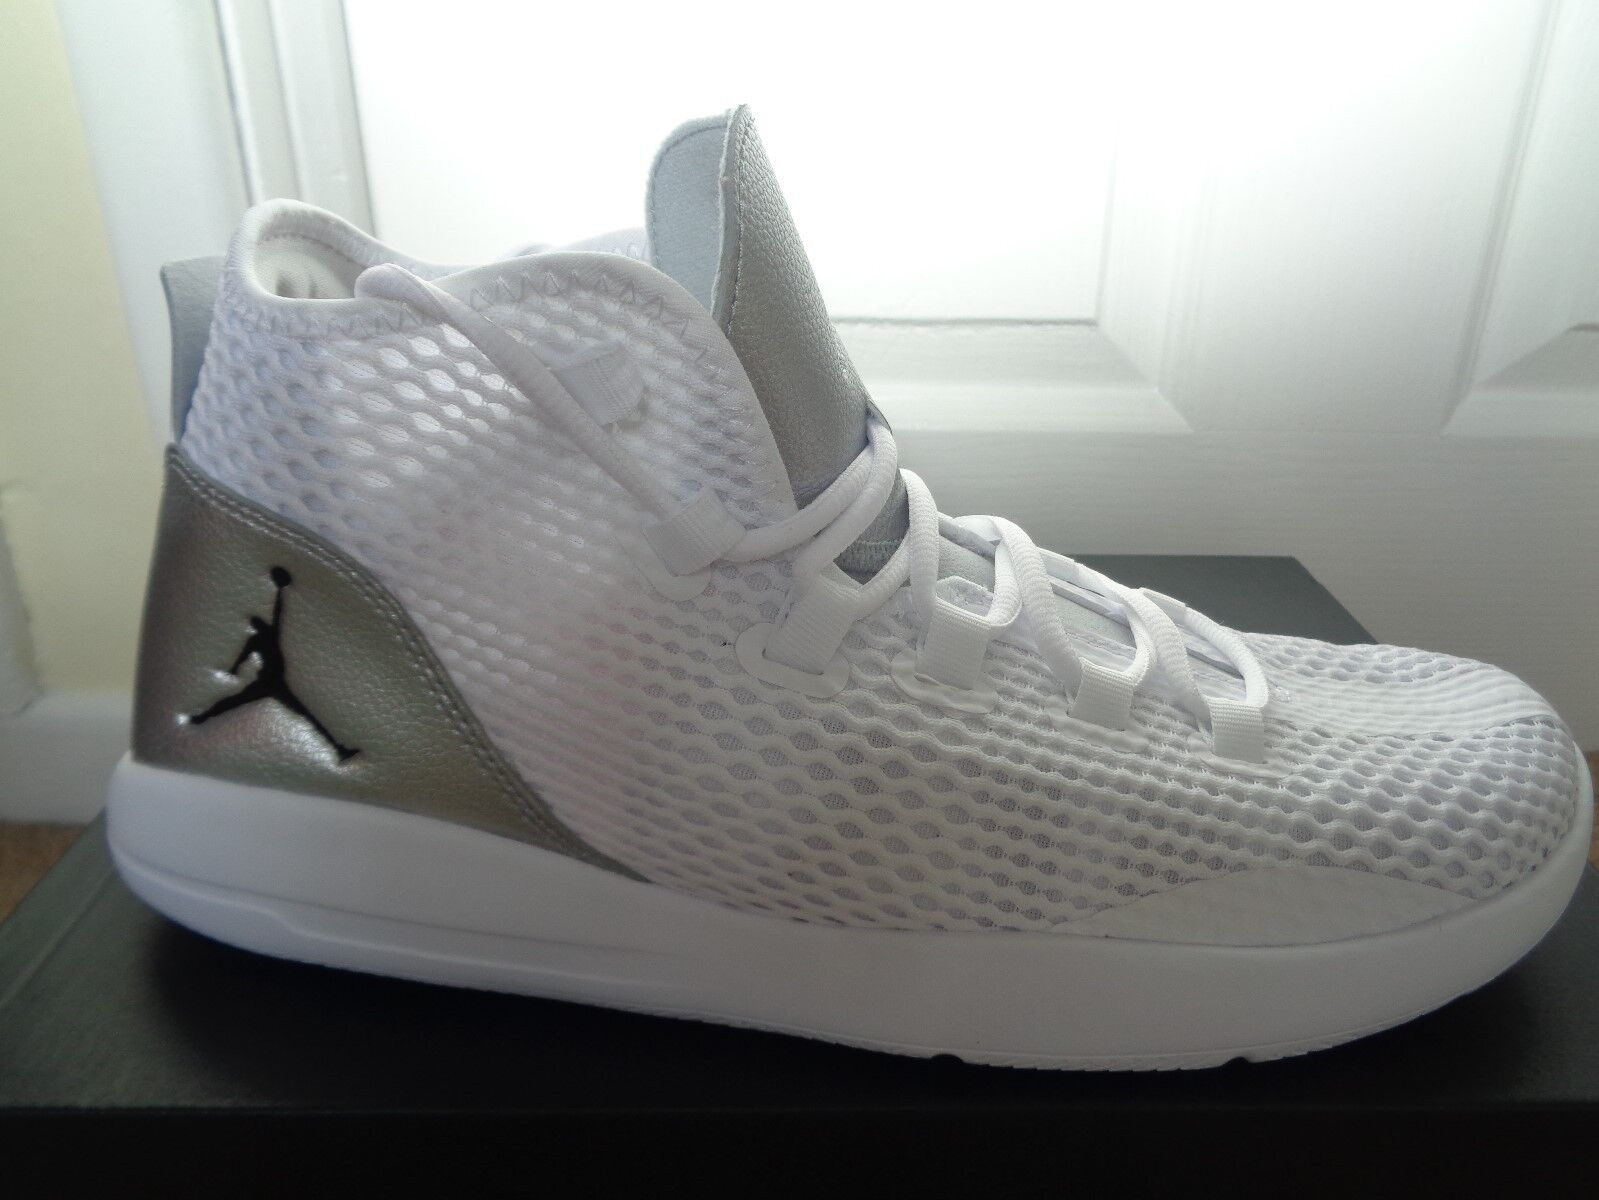 Nike Jordan Reveal 834064 100 trainers sneakers eu 45 us 11 NEW+BOX